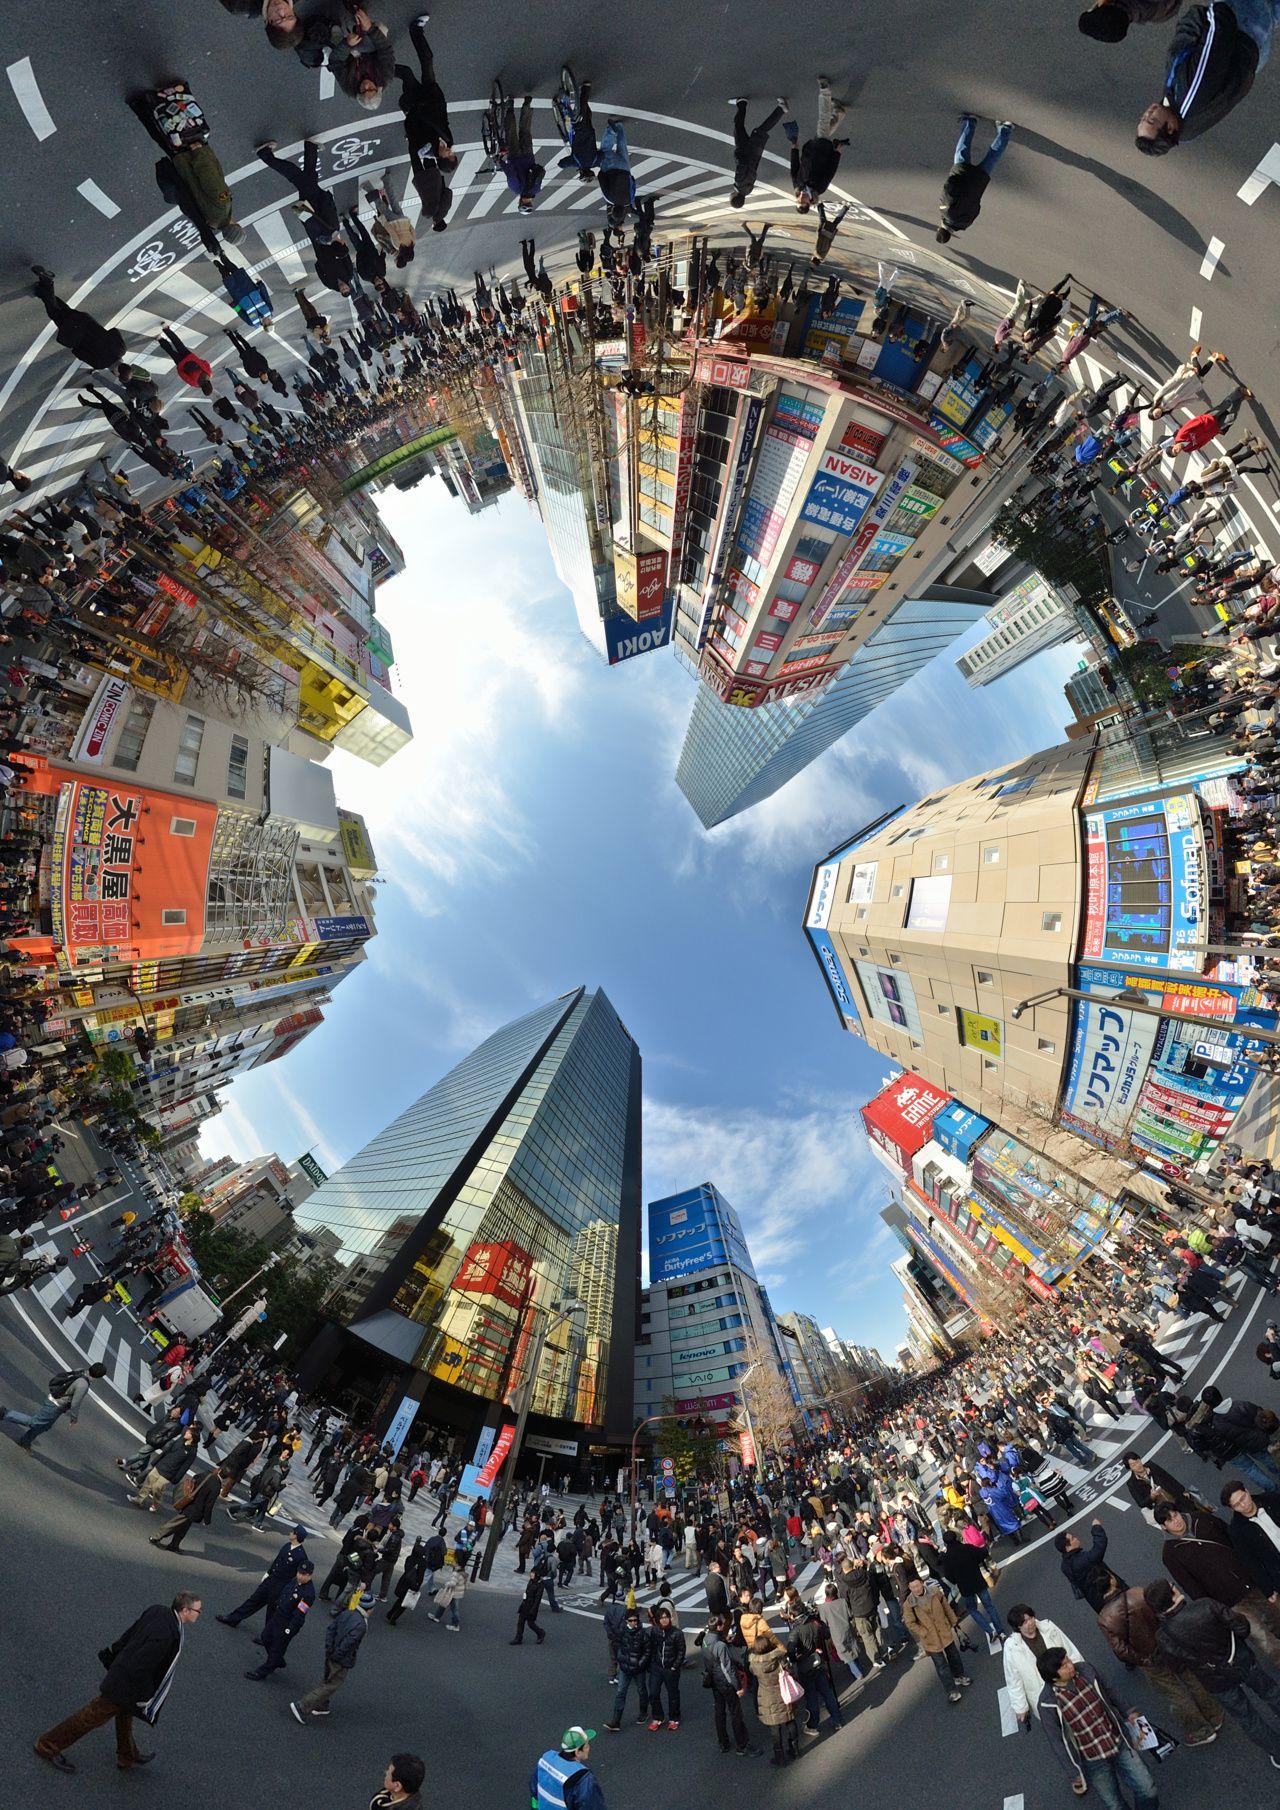 Akihabara car free zone    (pretty cool immersive view::  http://www.360cities.net/image/akihabara-chuo-street-crossing-akihabara-tokyo : )